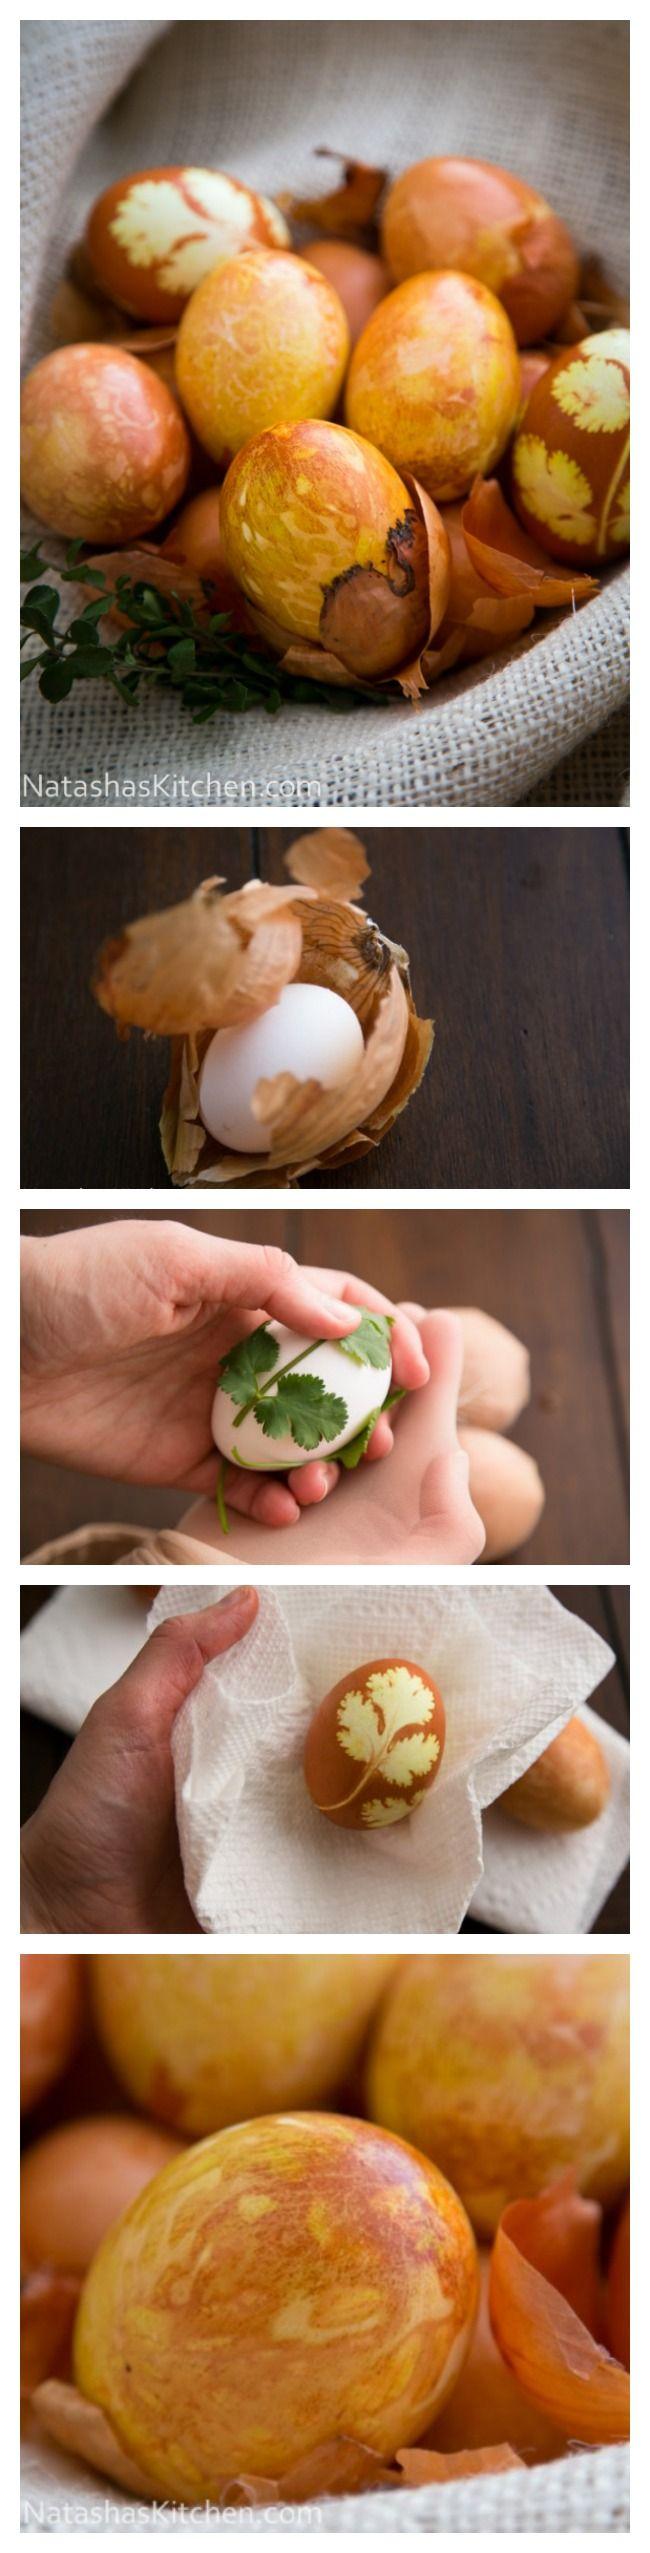 Old World (Natural) Easter Eggs - 3 ways! @natashaskitchen